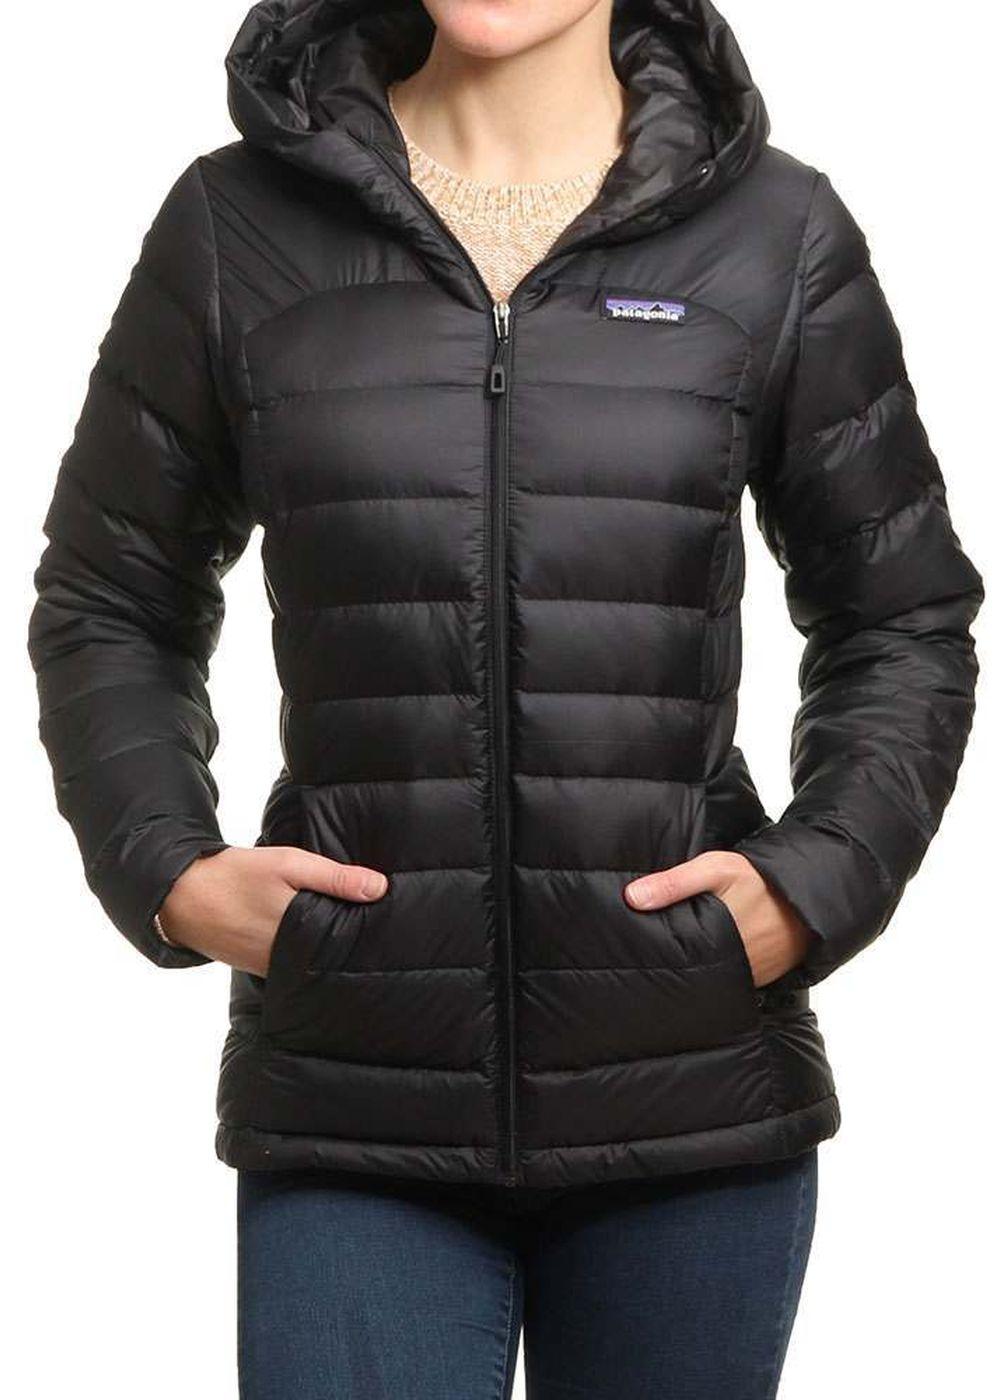 patagonia-hiloft-down-sweater-black